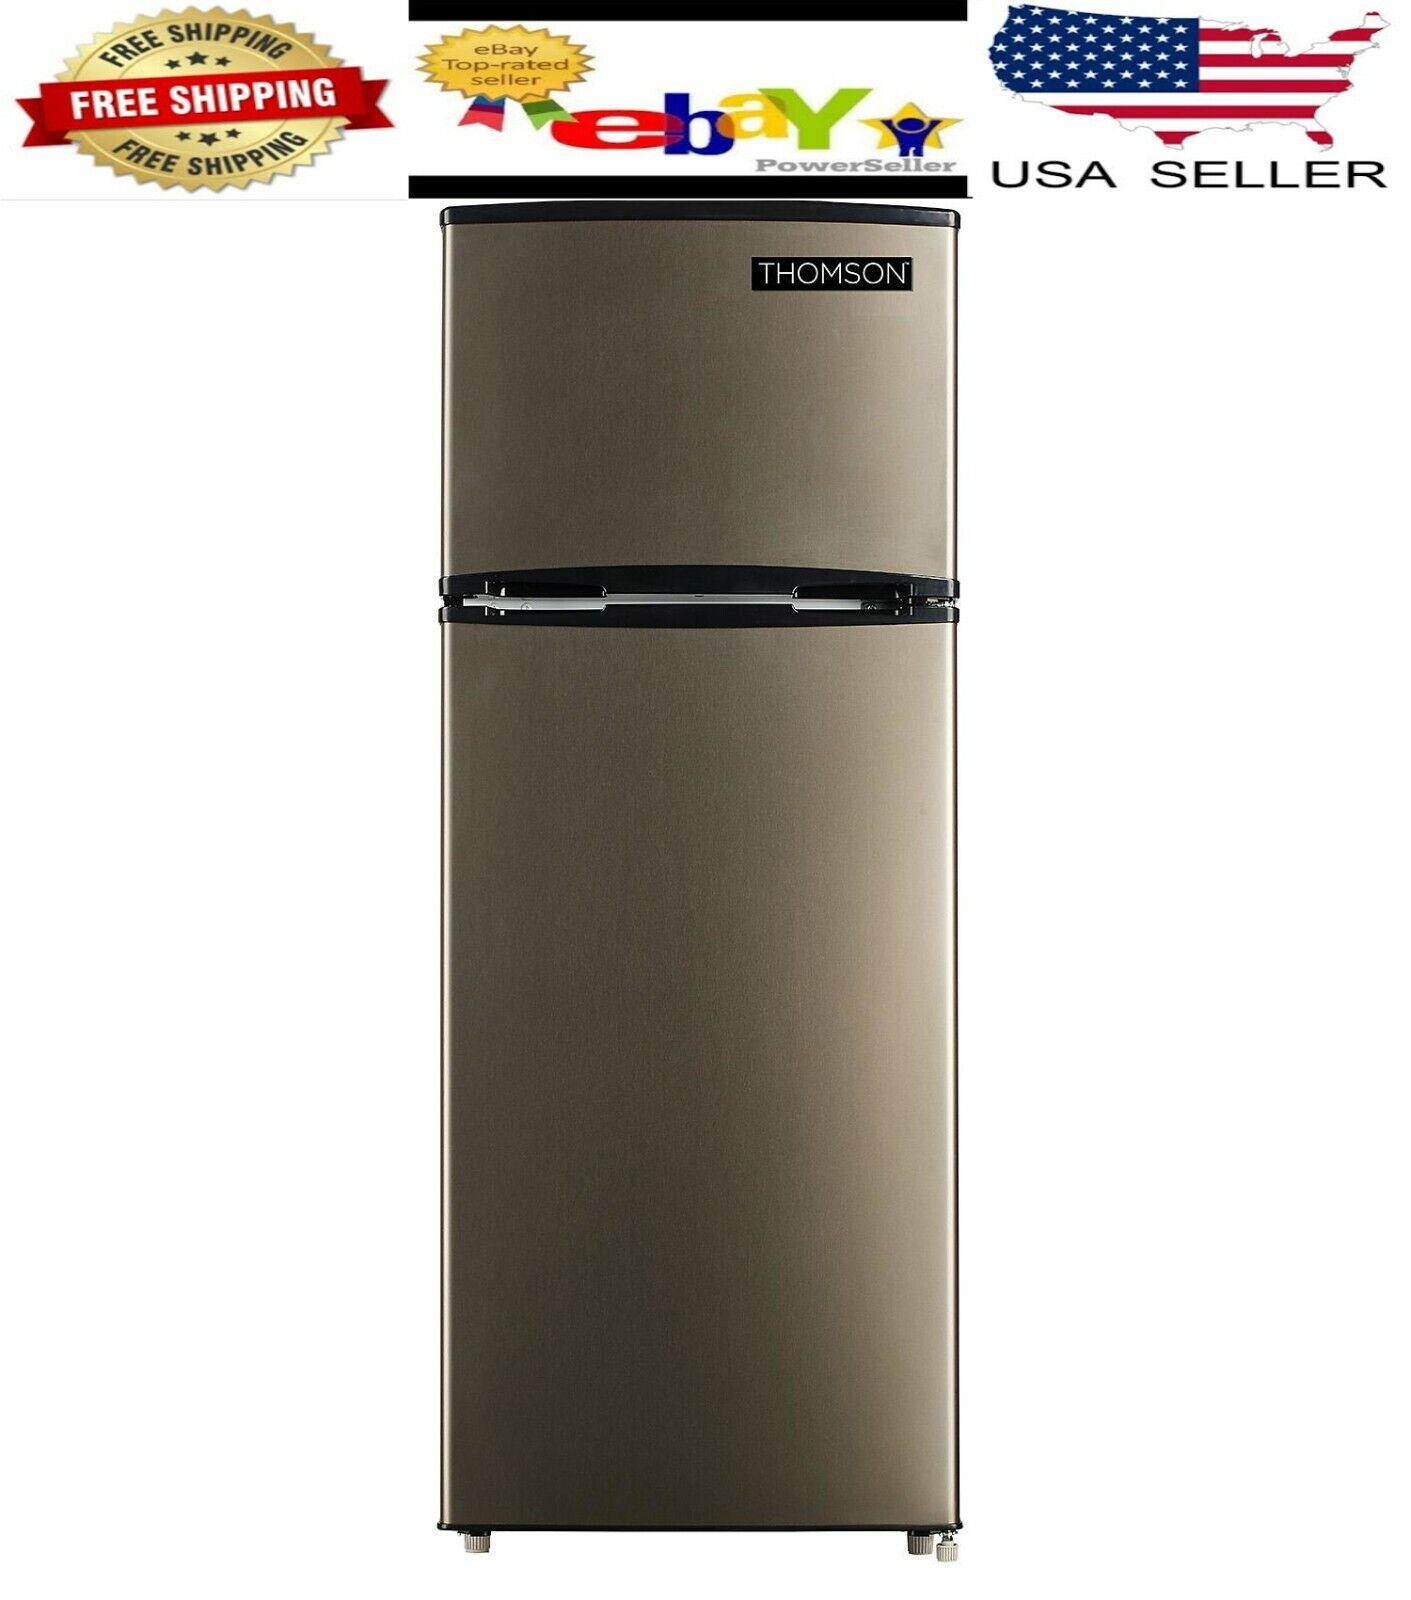 Thomson 7.5 cu ft Top Freezer Refrigerator Temperature Controlled Space Saving